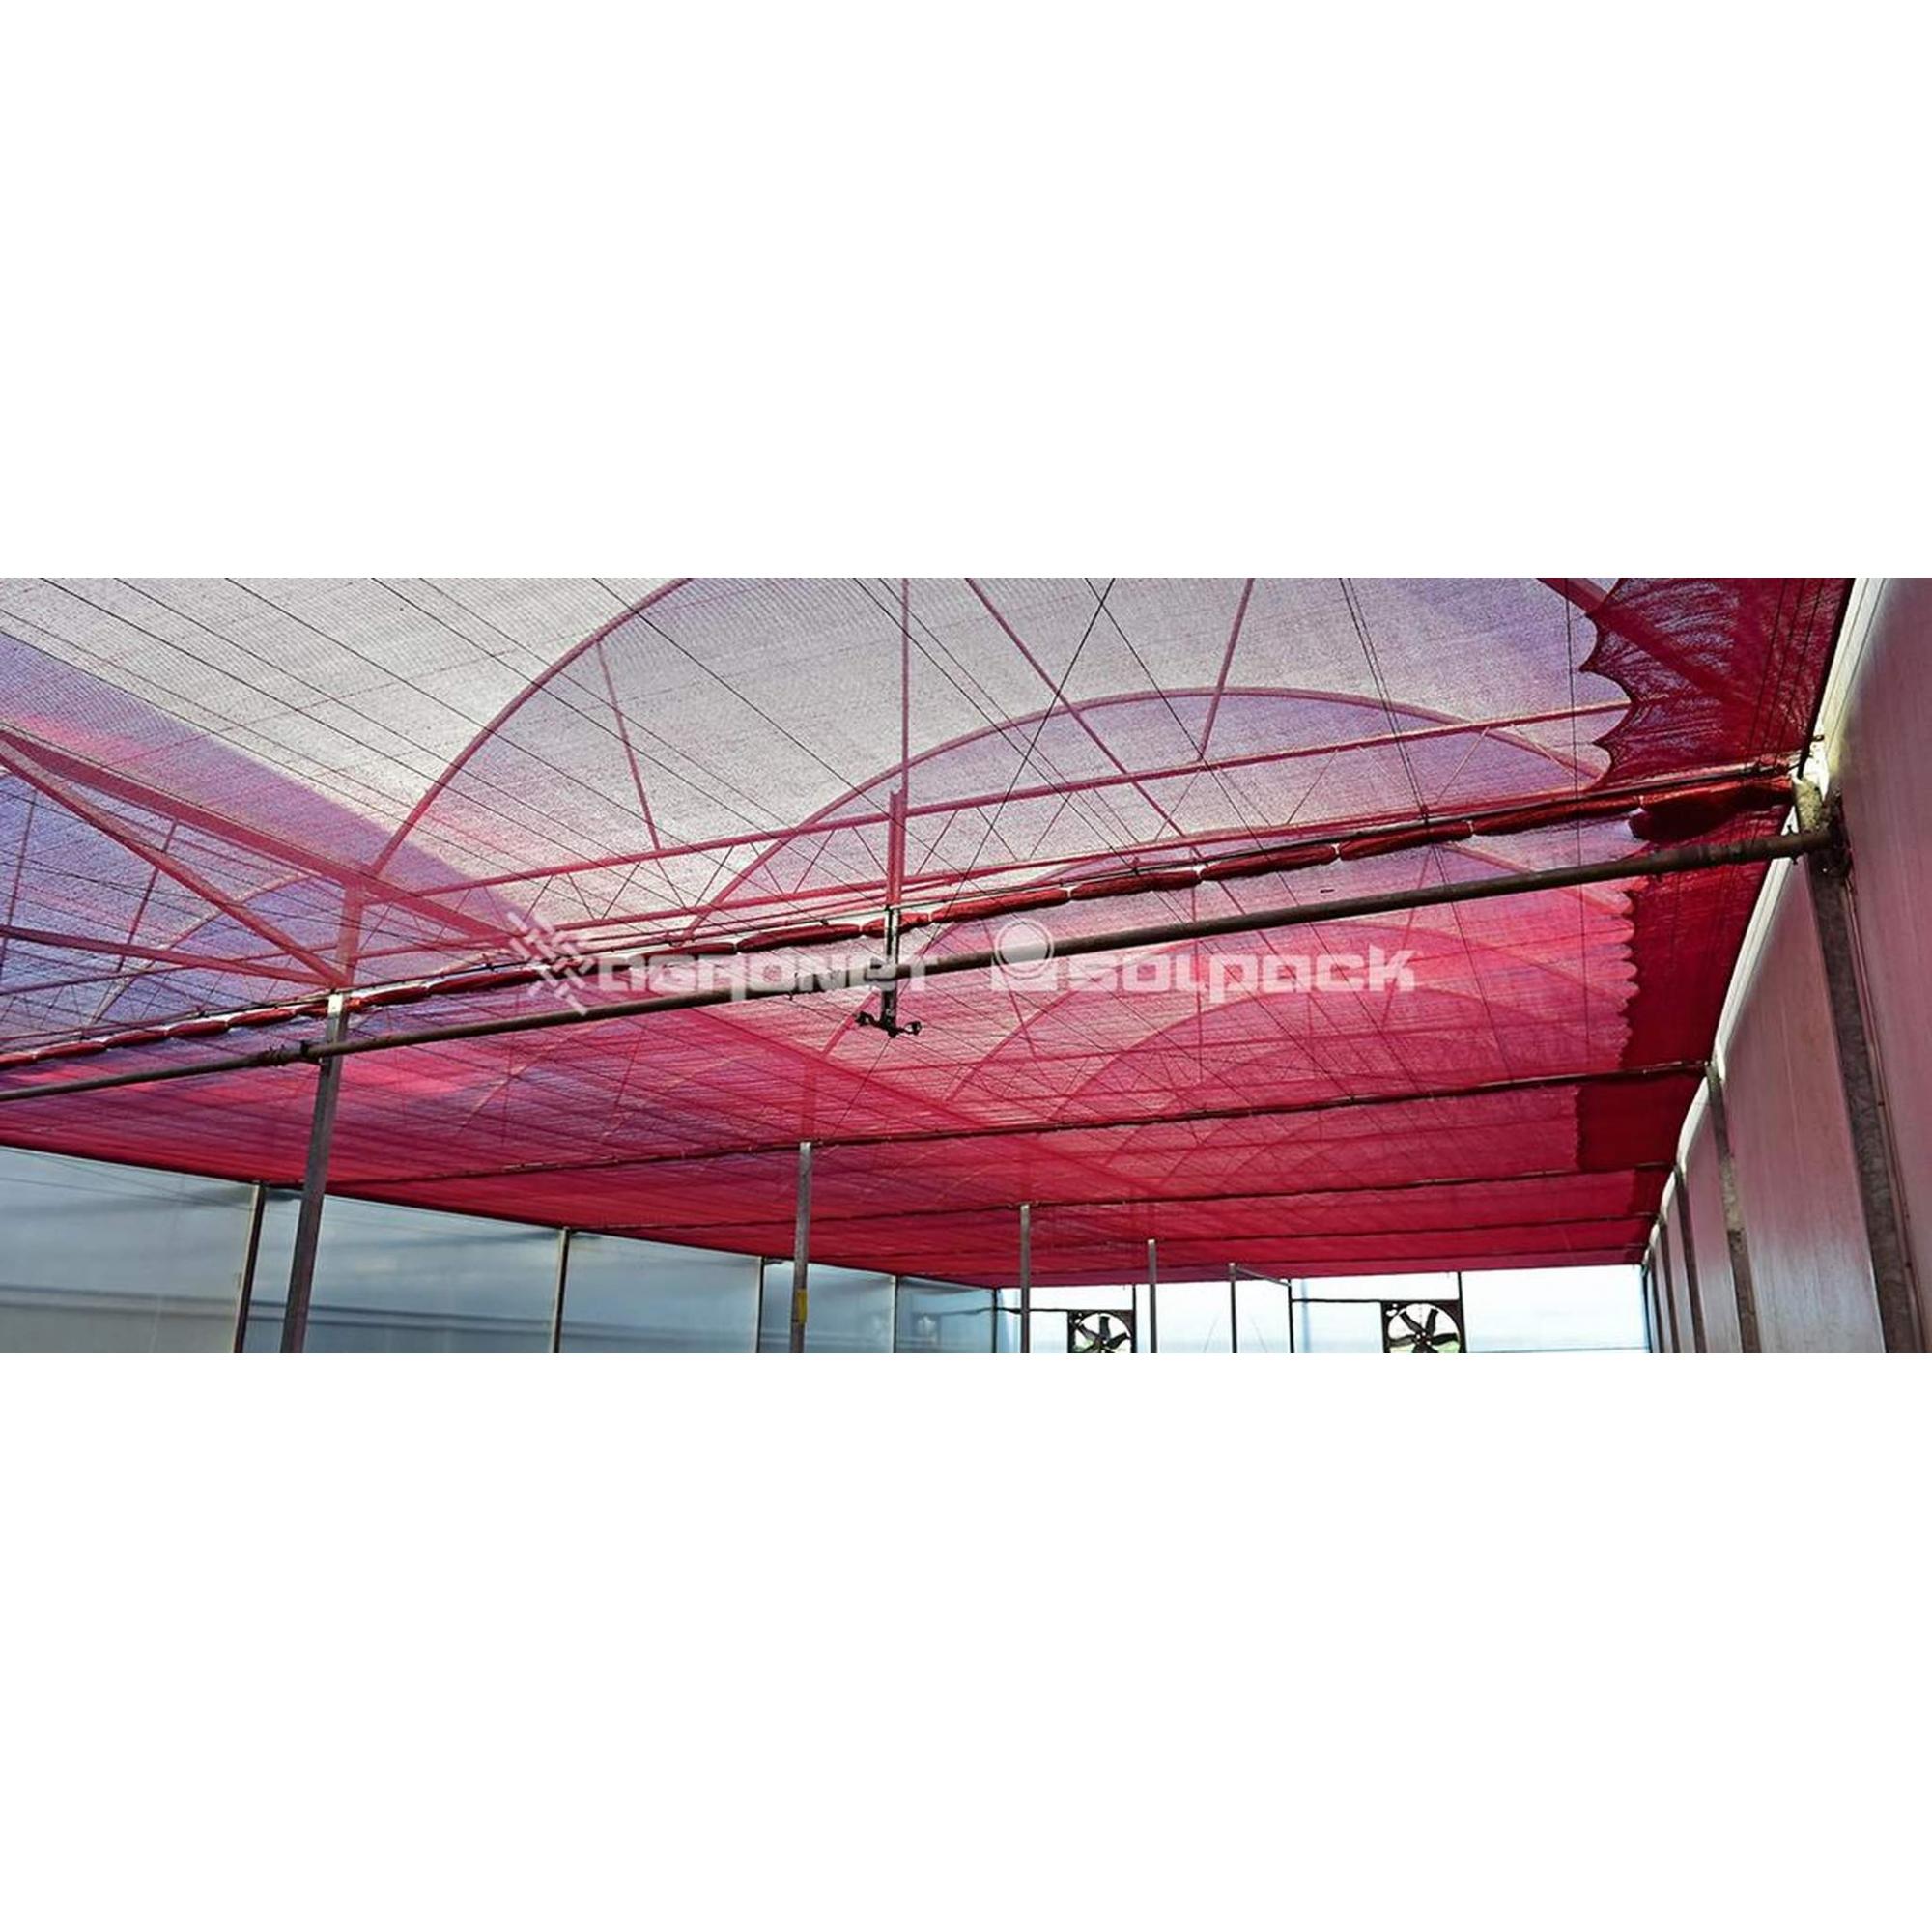 Tela de Sombreamento Vermelha Ultranet - Largura: 6 Metros